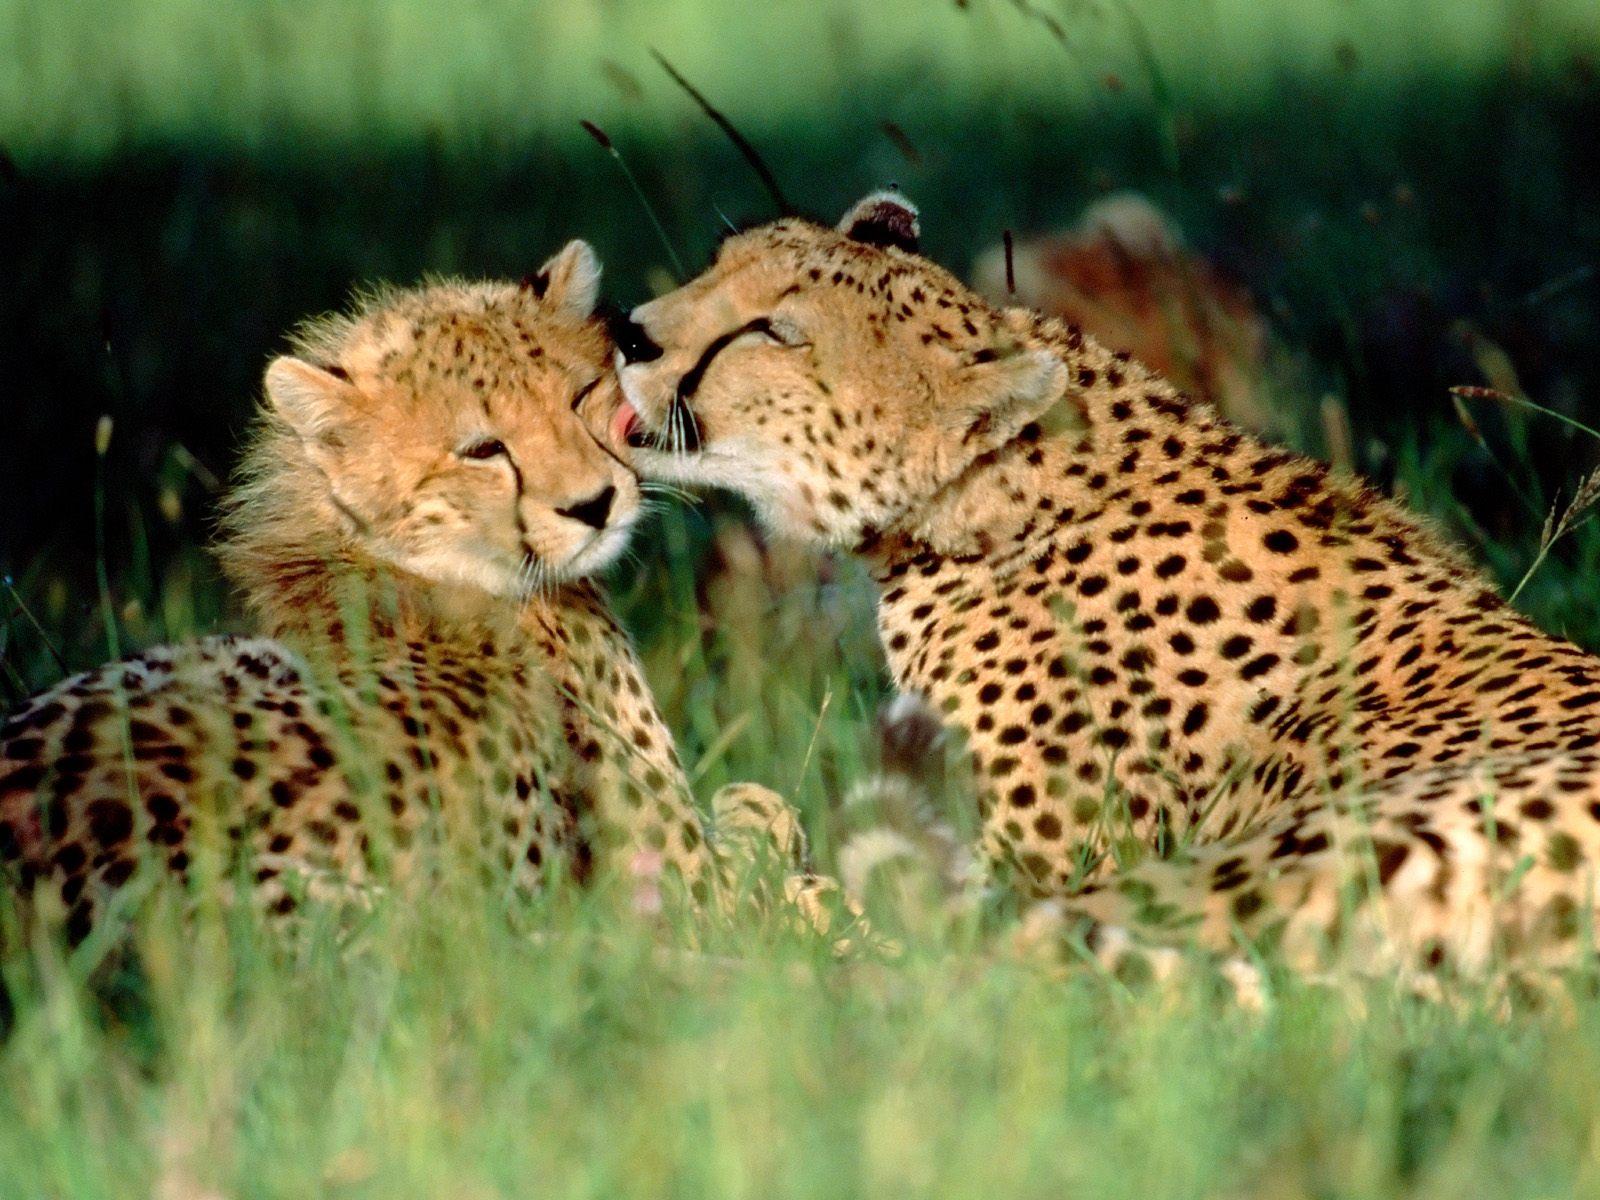 Affectionate Cheetahs HD Wallpapers 1 Ewallpapers Hub - affectionate cheetahs wallpapers